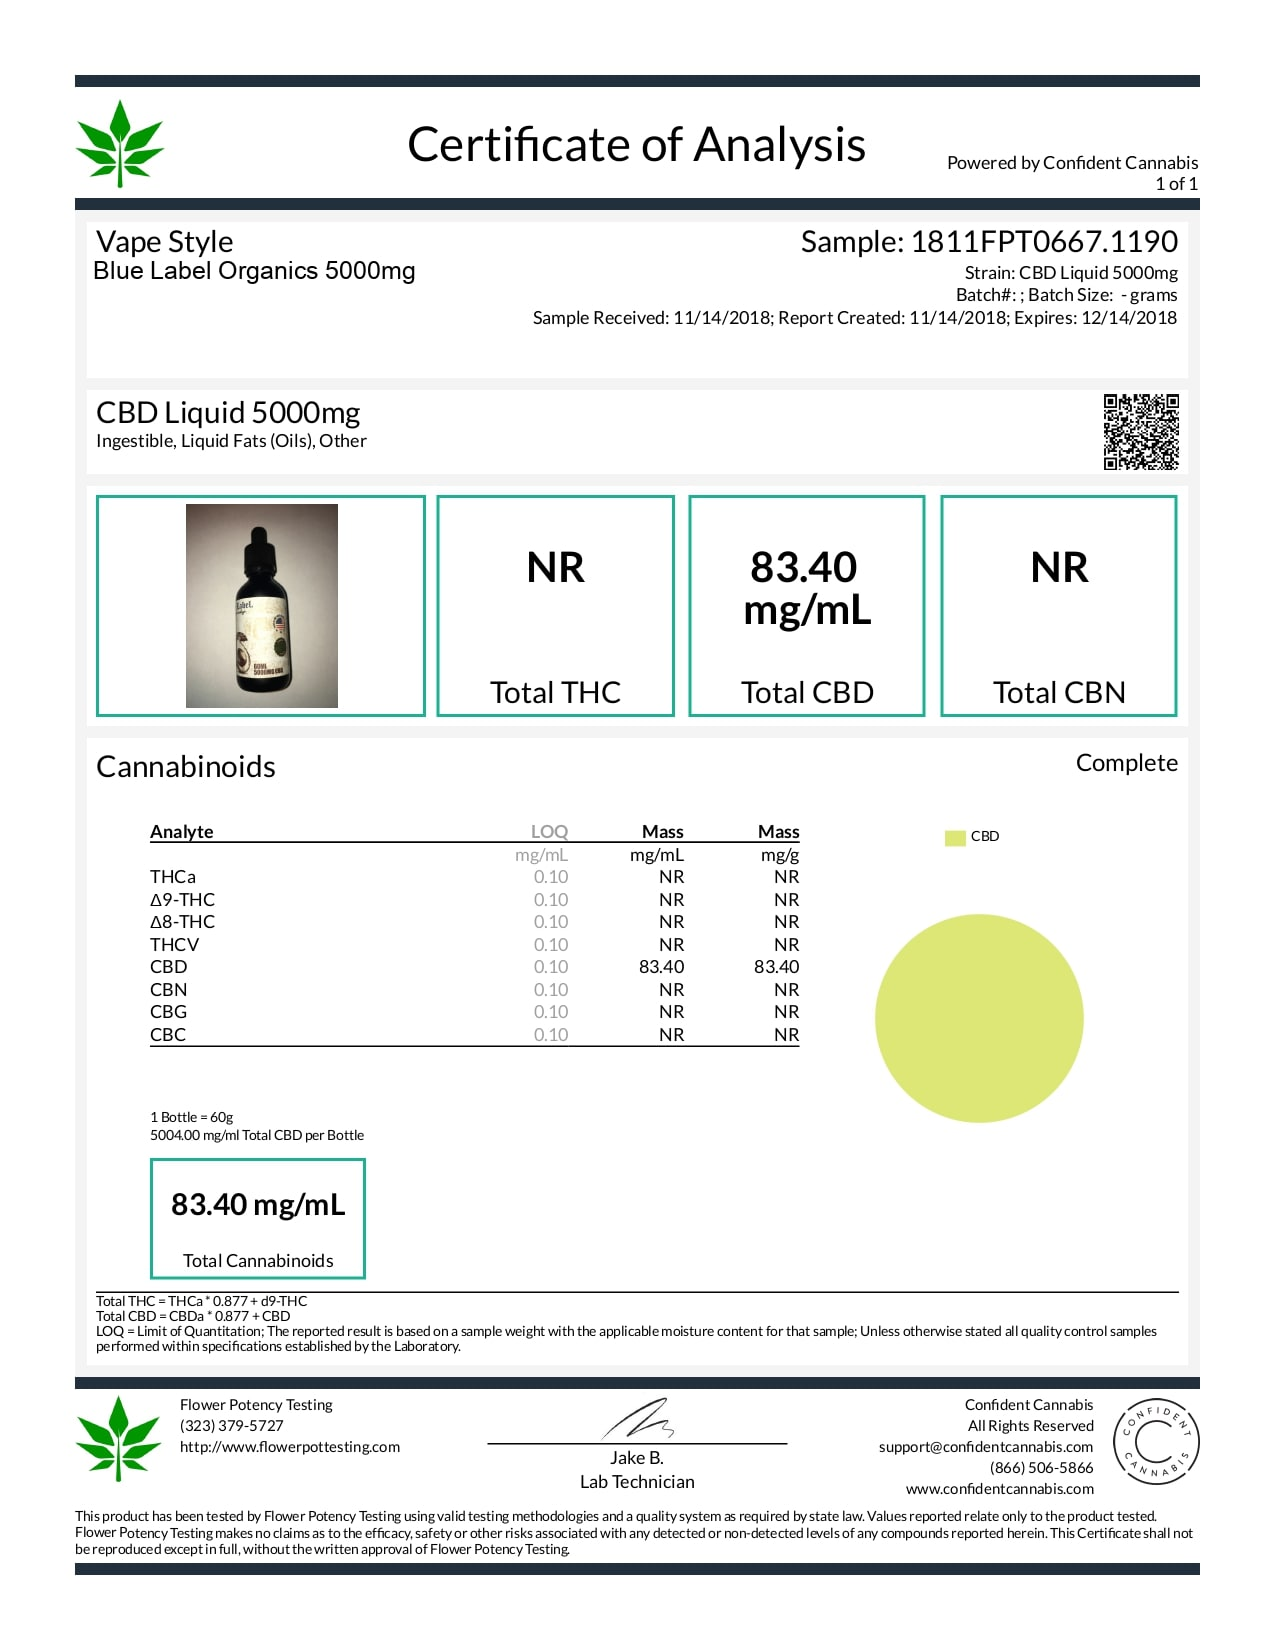 Blue Label CBD Tincture Organic Avocado 5000mg Lab Report